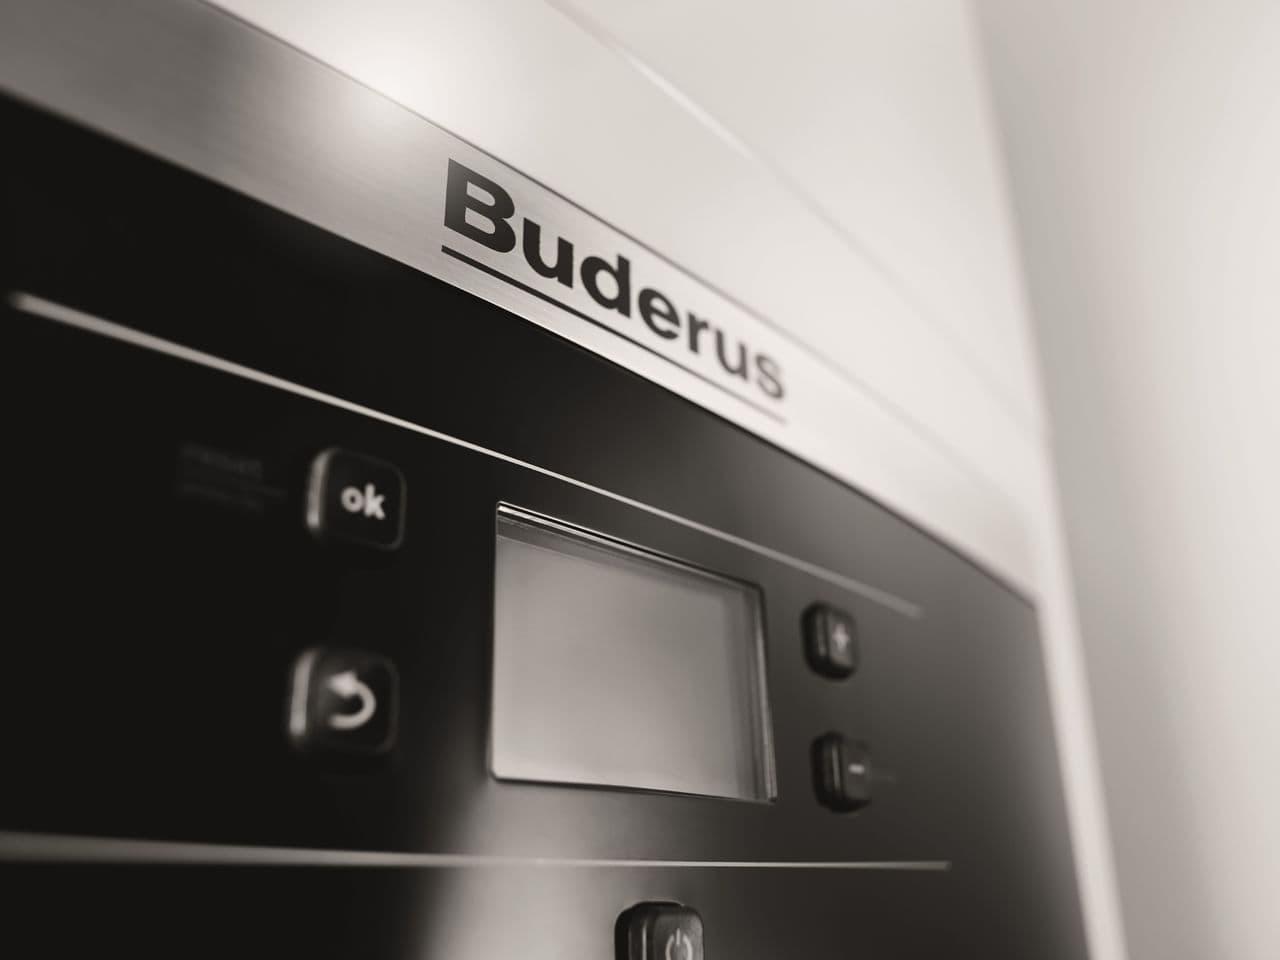 Buderus Logamax U072-12K (двухконтурный) - фото Buderus%202.jpg